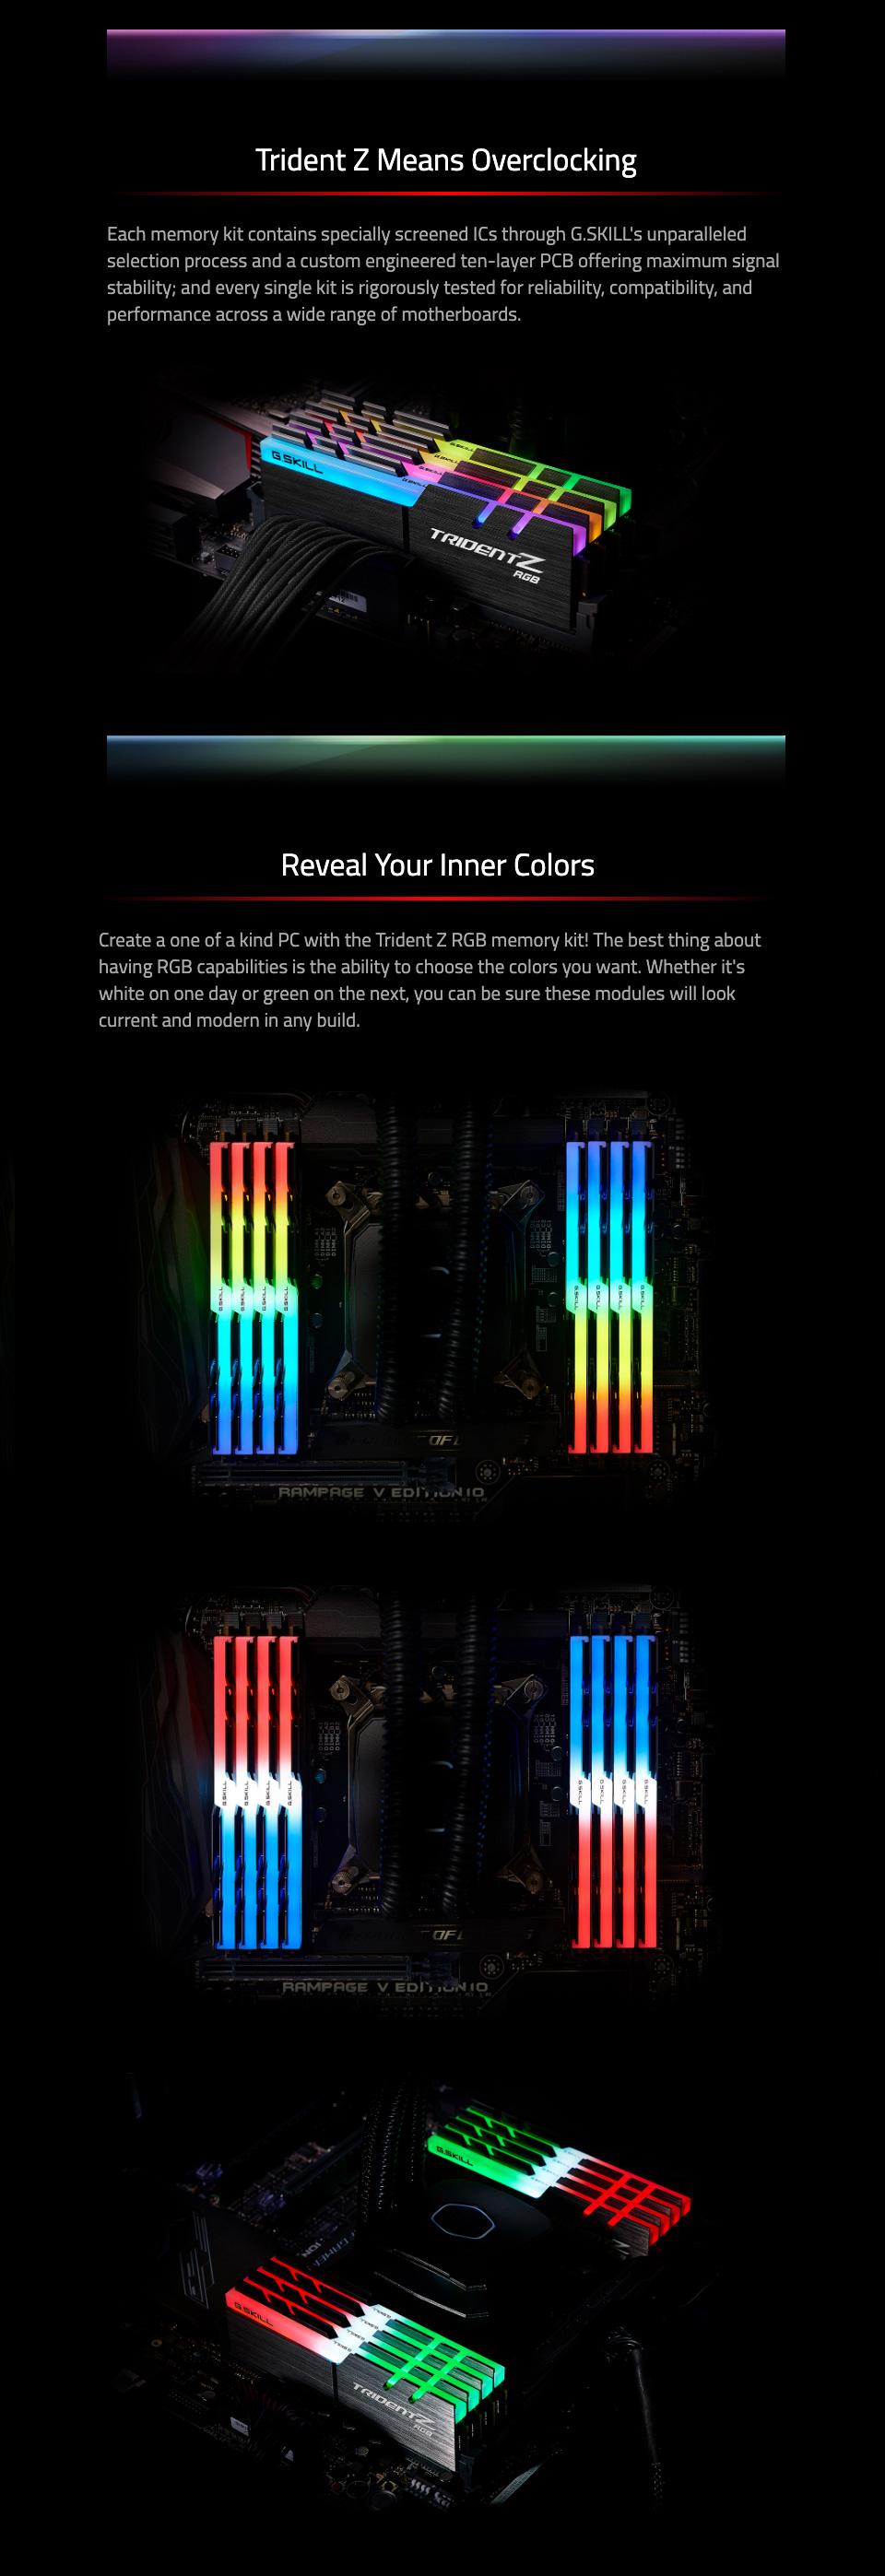 G.Skill Trident Z RGB F4-3600C16D-32GTZR 32GB (2x16GB) DDR4 features 2